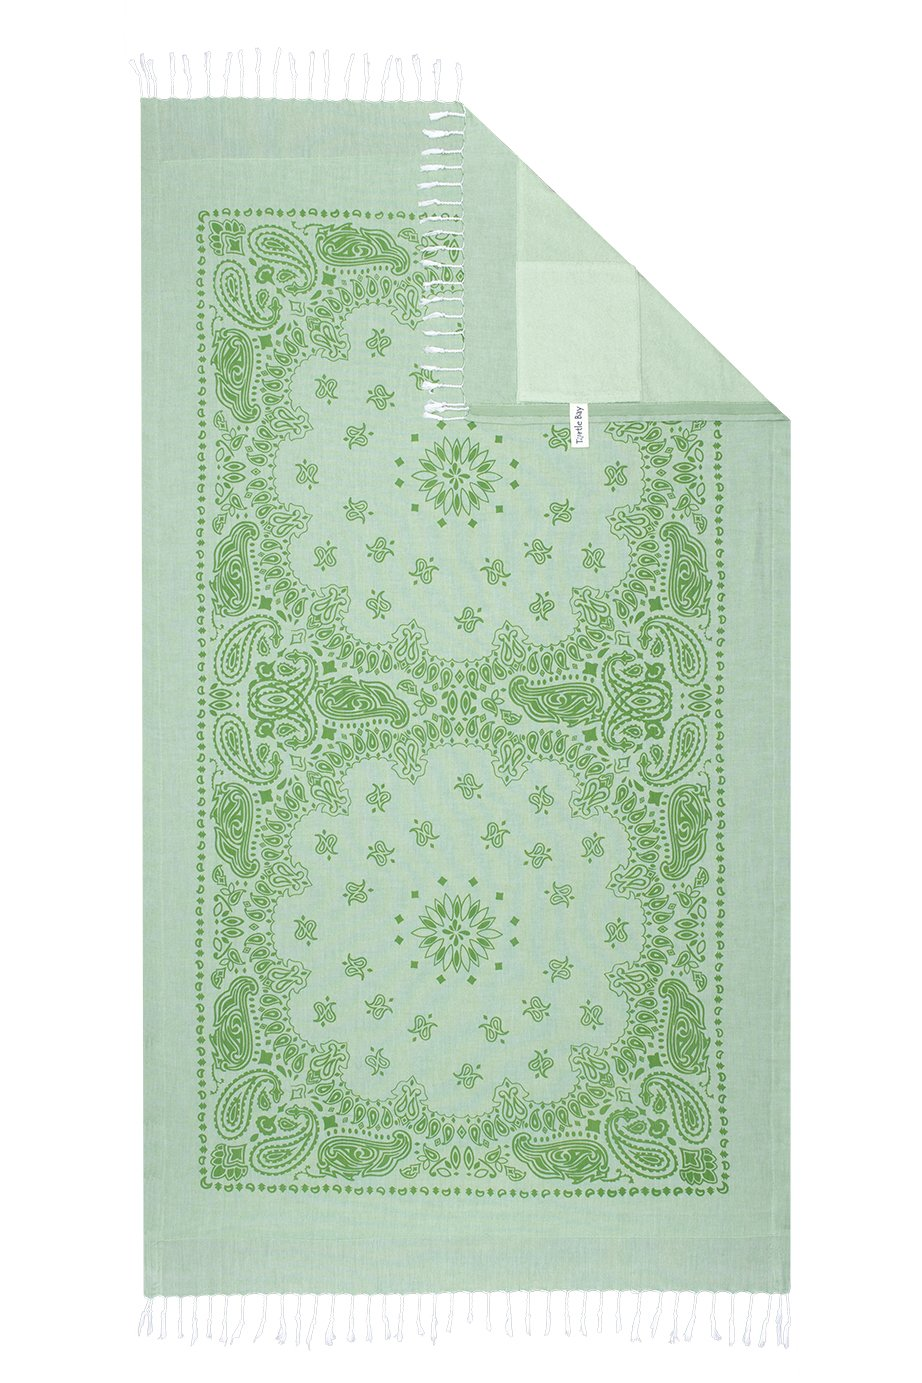 Turtle Bay - Toalla de playa / Pareo - Toalla de baño - Kikoy Towel Paisley - Color : Minty Green/Spring Green - Tamaño : 95 x 170 cms: Amazon.es: Hogar